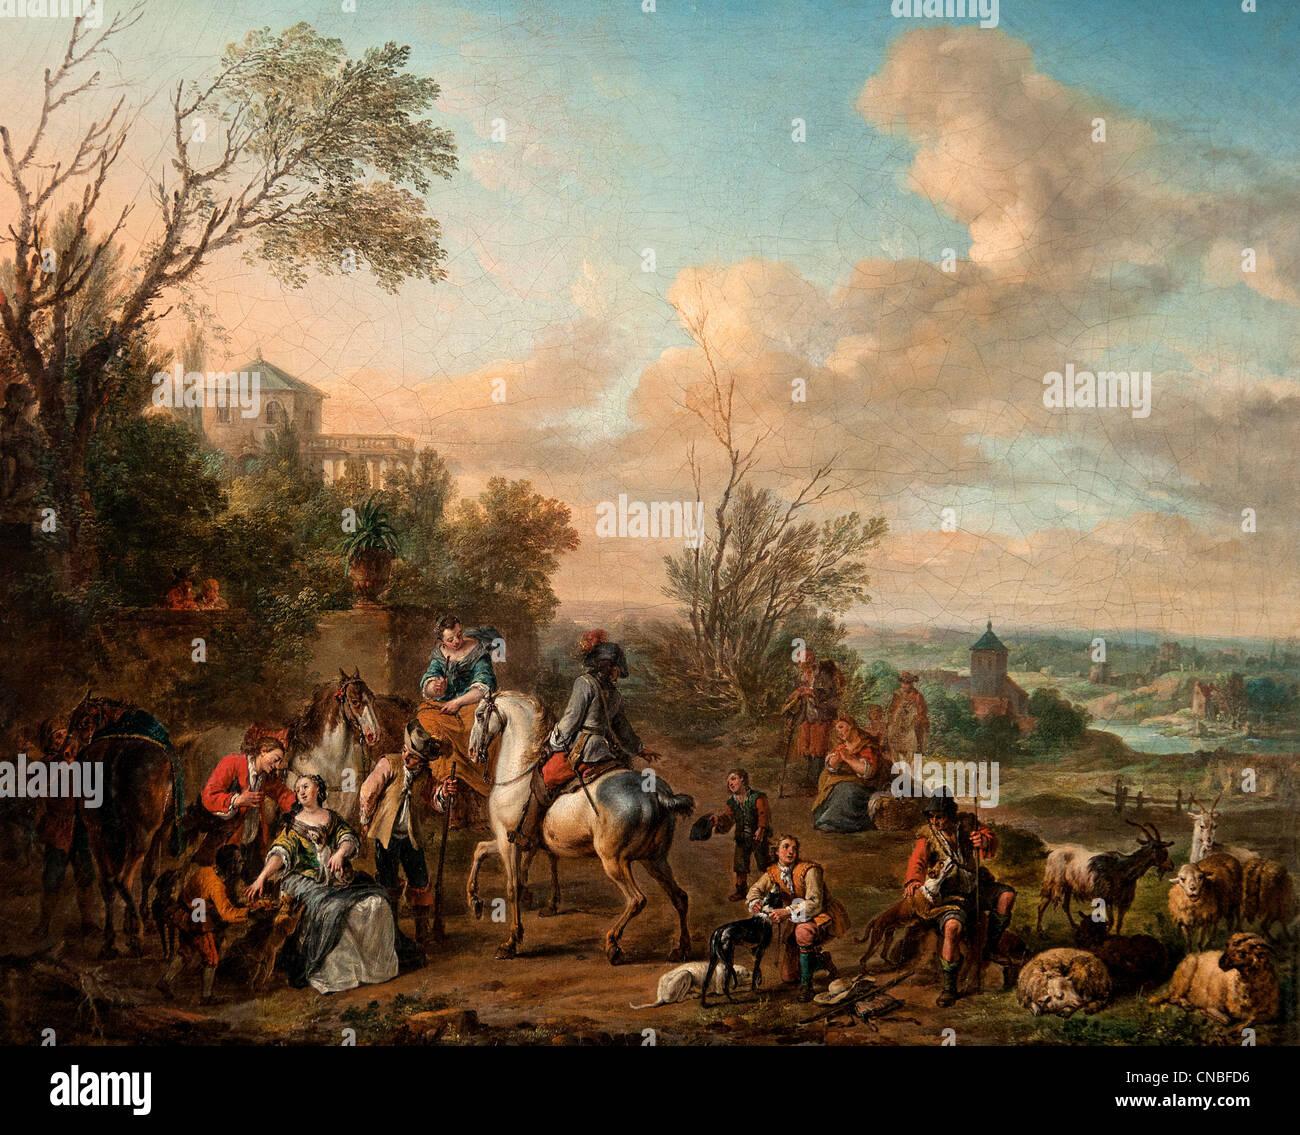 HALTE DE CHASSEURS - STOP HUNTERS 1703 by Carel Van FALENS 1683 -1733 Flemish Flandres - Stock Image